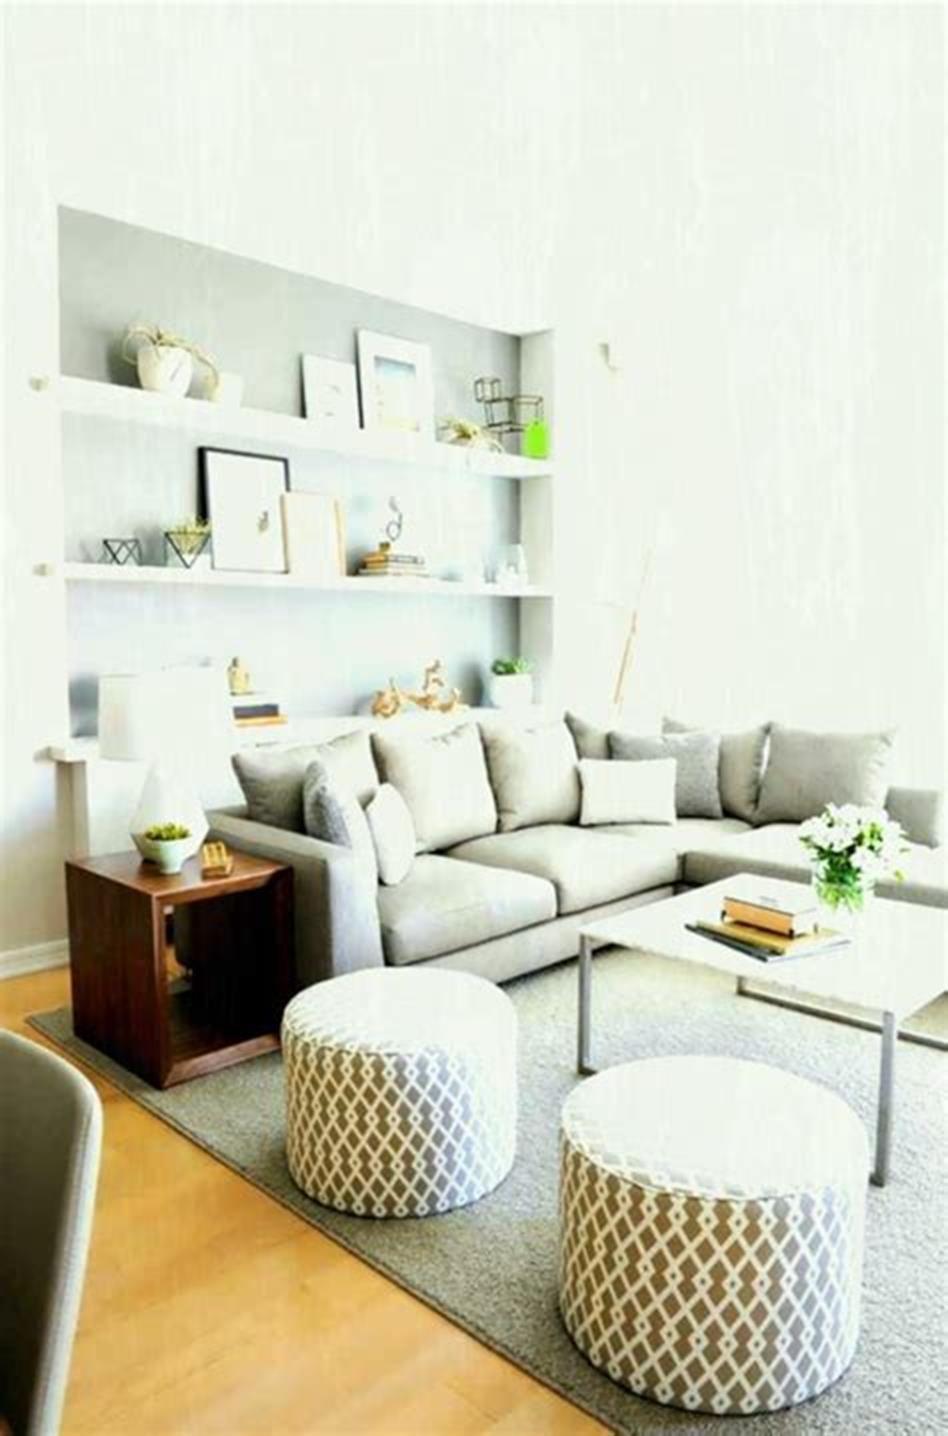 50 Best Cheap Family Living Room Storage Furniture Ideas 2019 60 Avec Images Home And Deco Deco Maison Amenagement Chambre